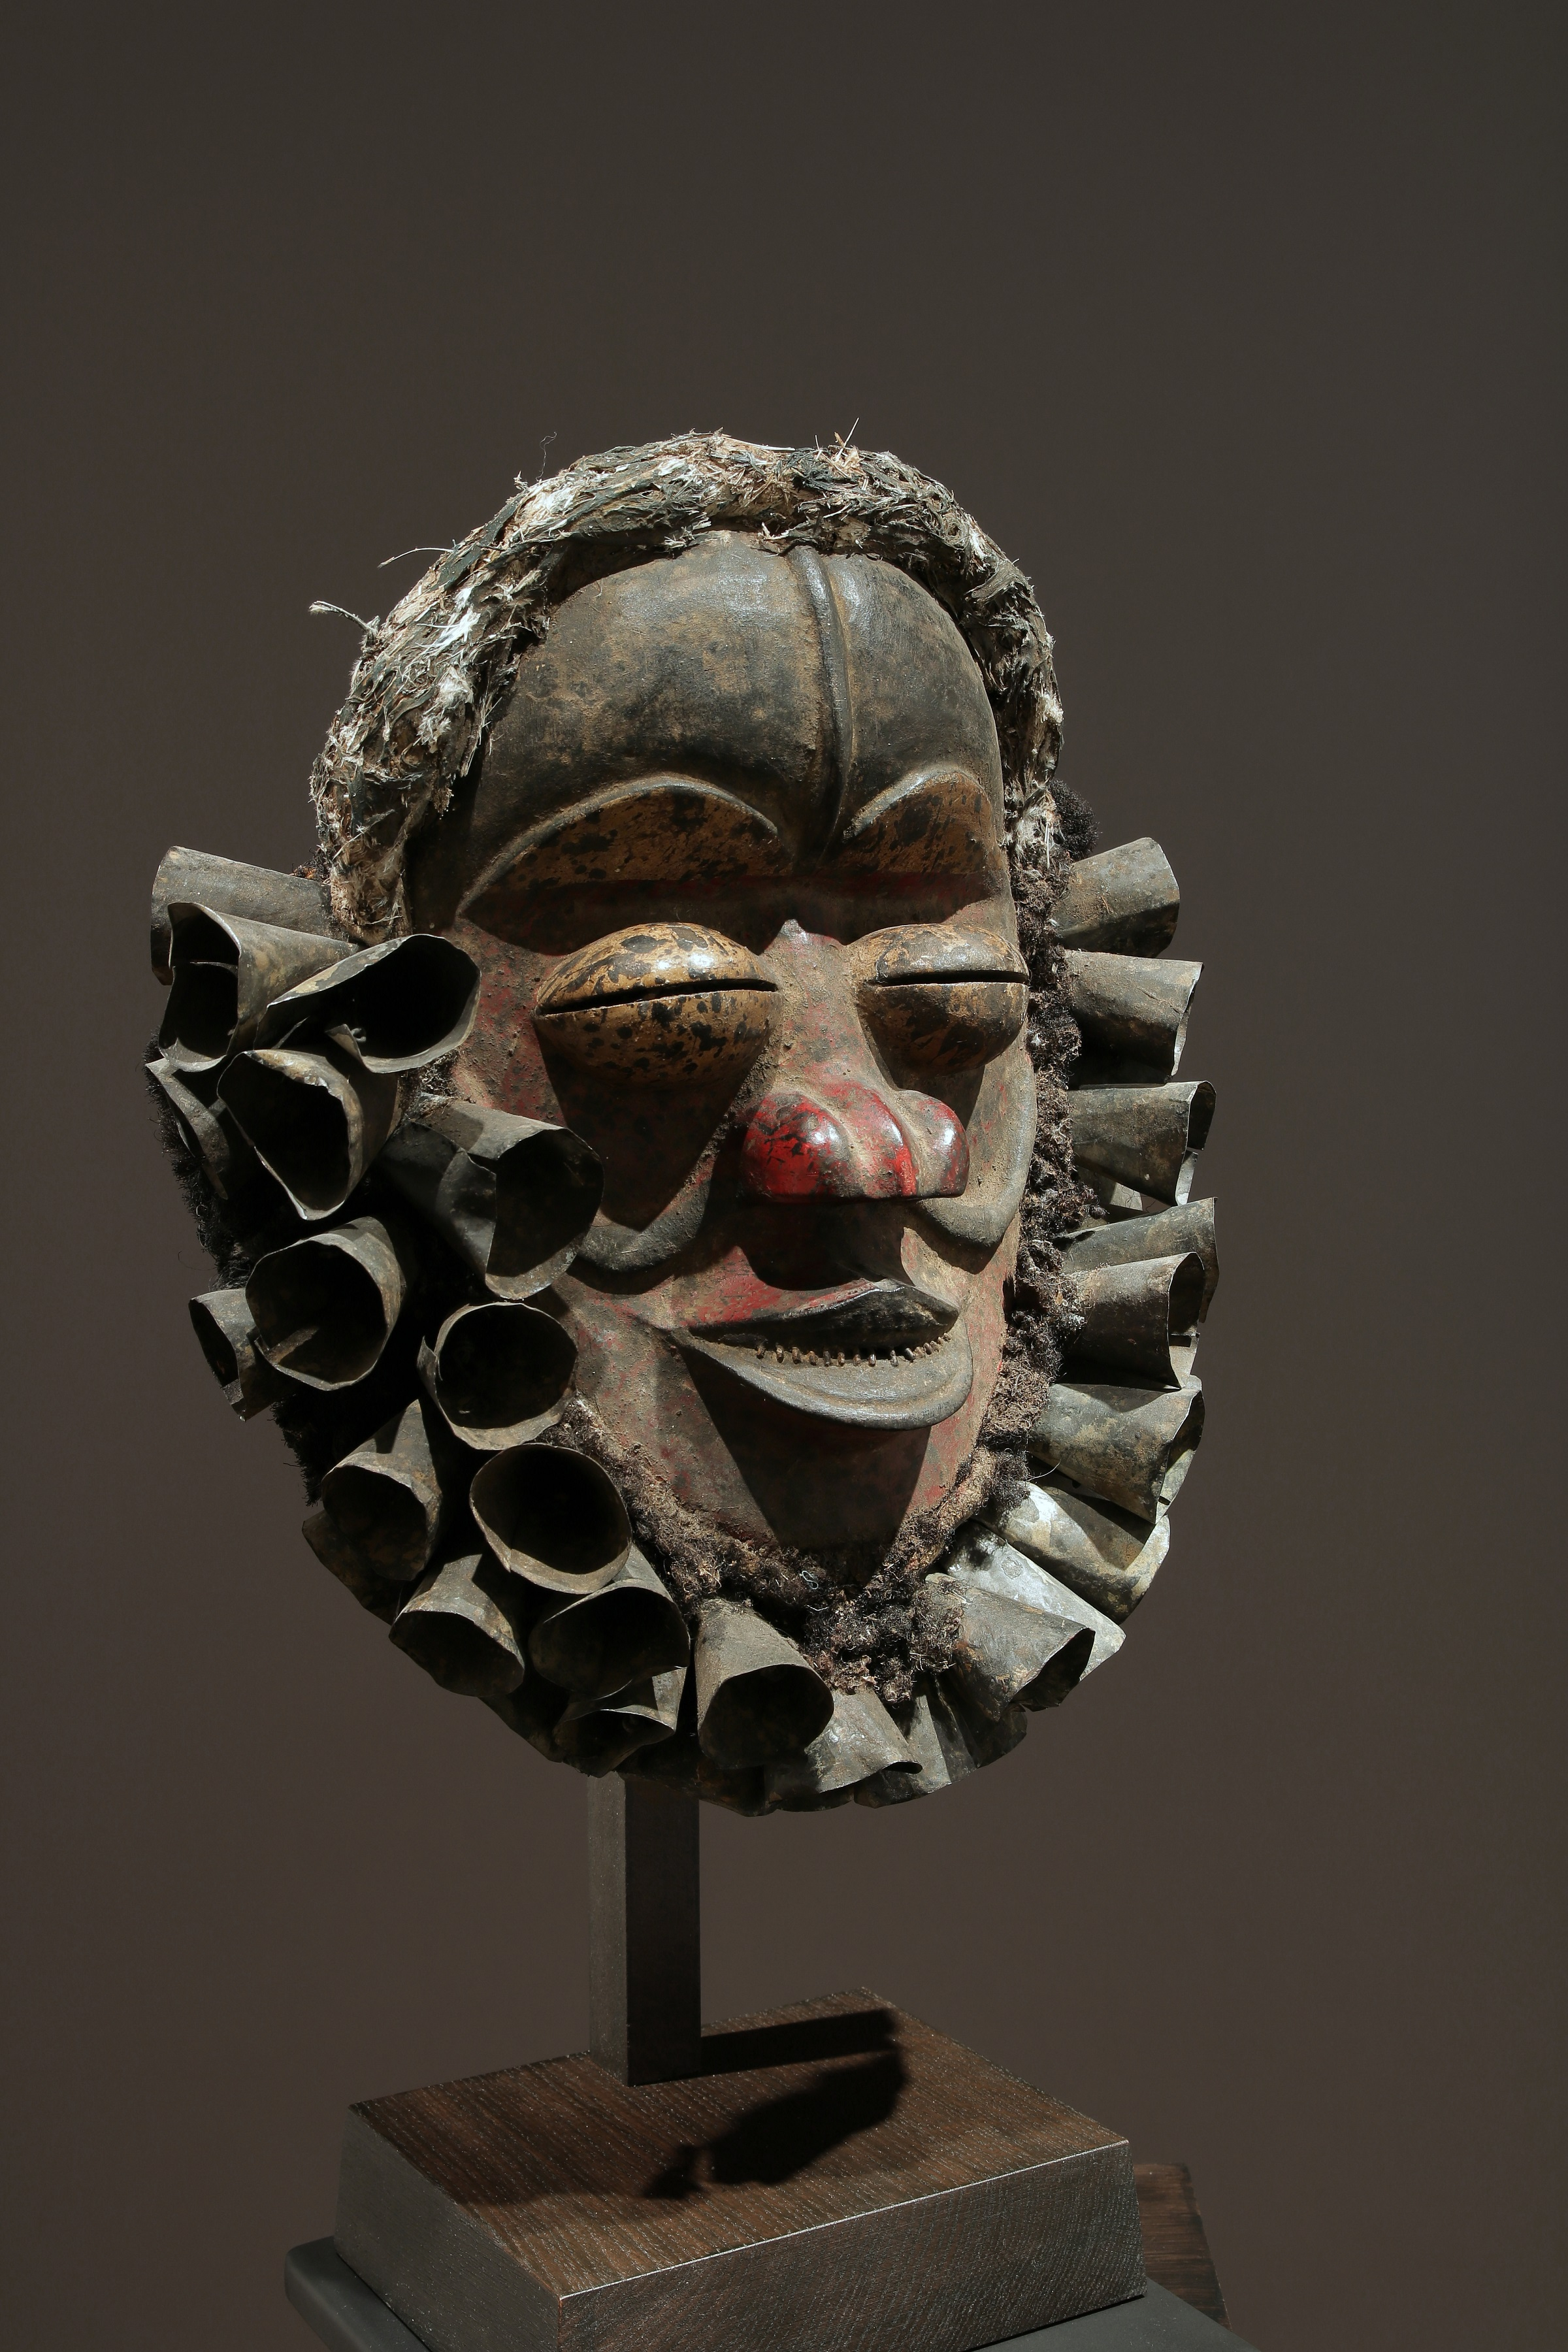 """Ble zri"" or ""Kpepo gla"" face mask"